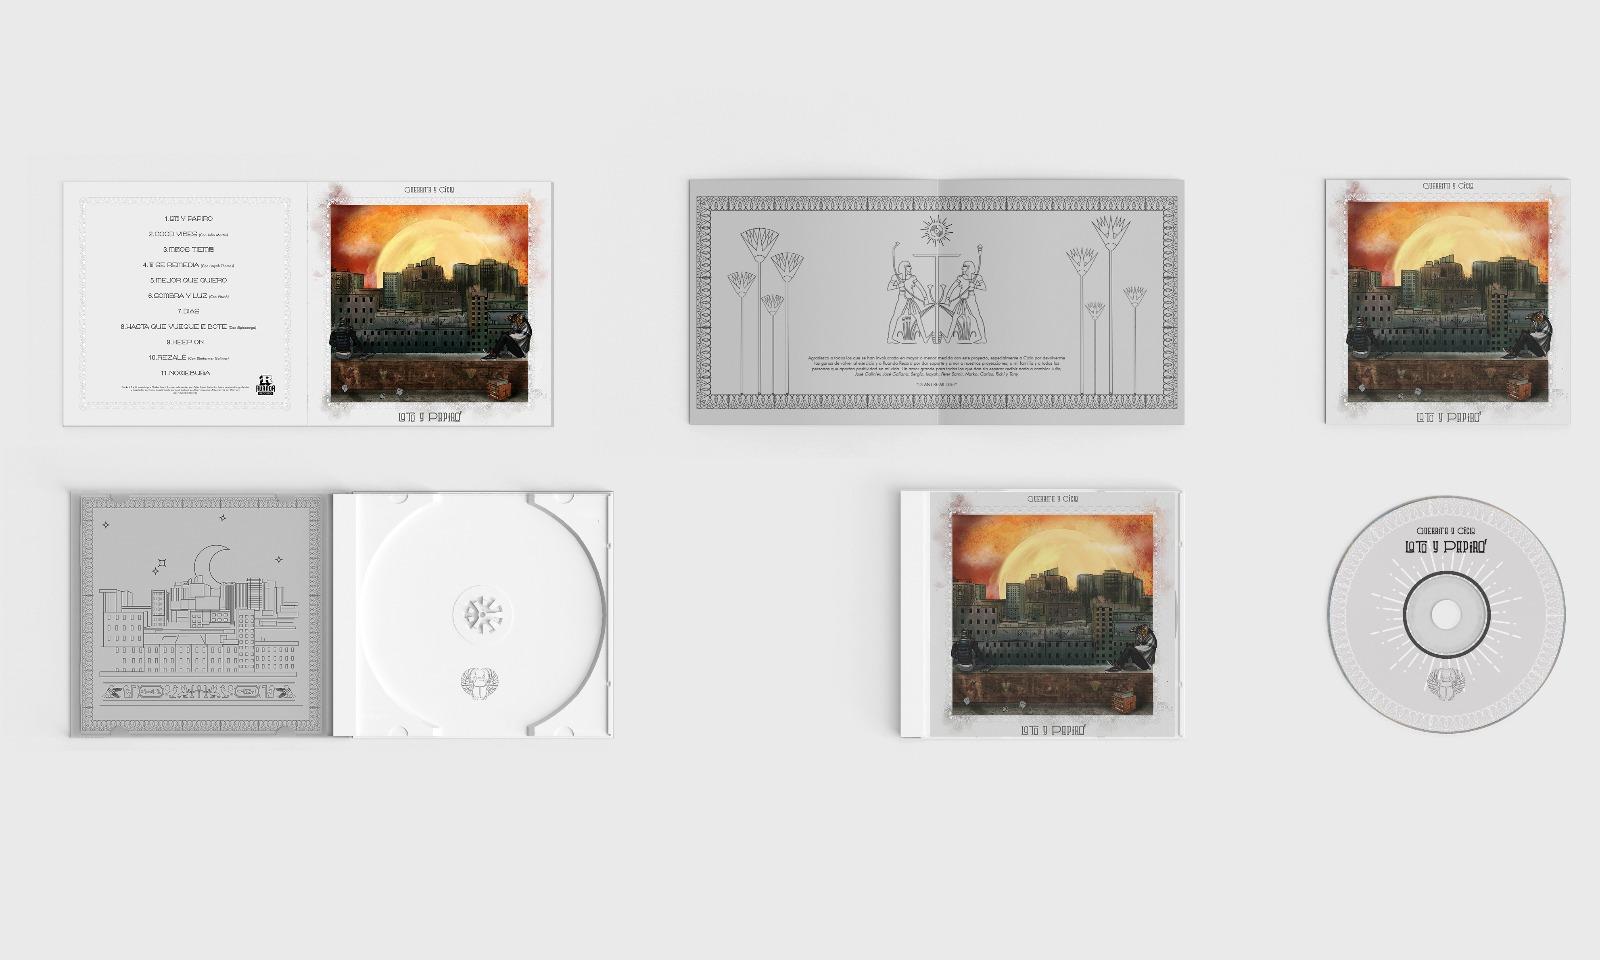 CD Loto y Papiro